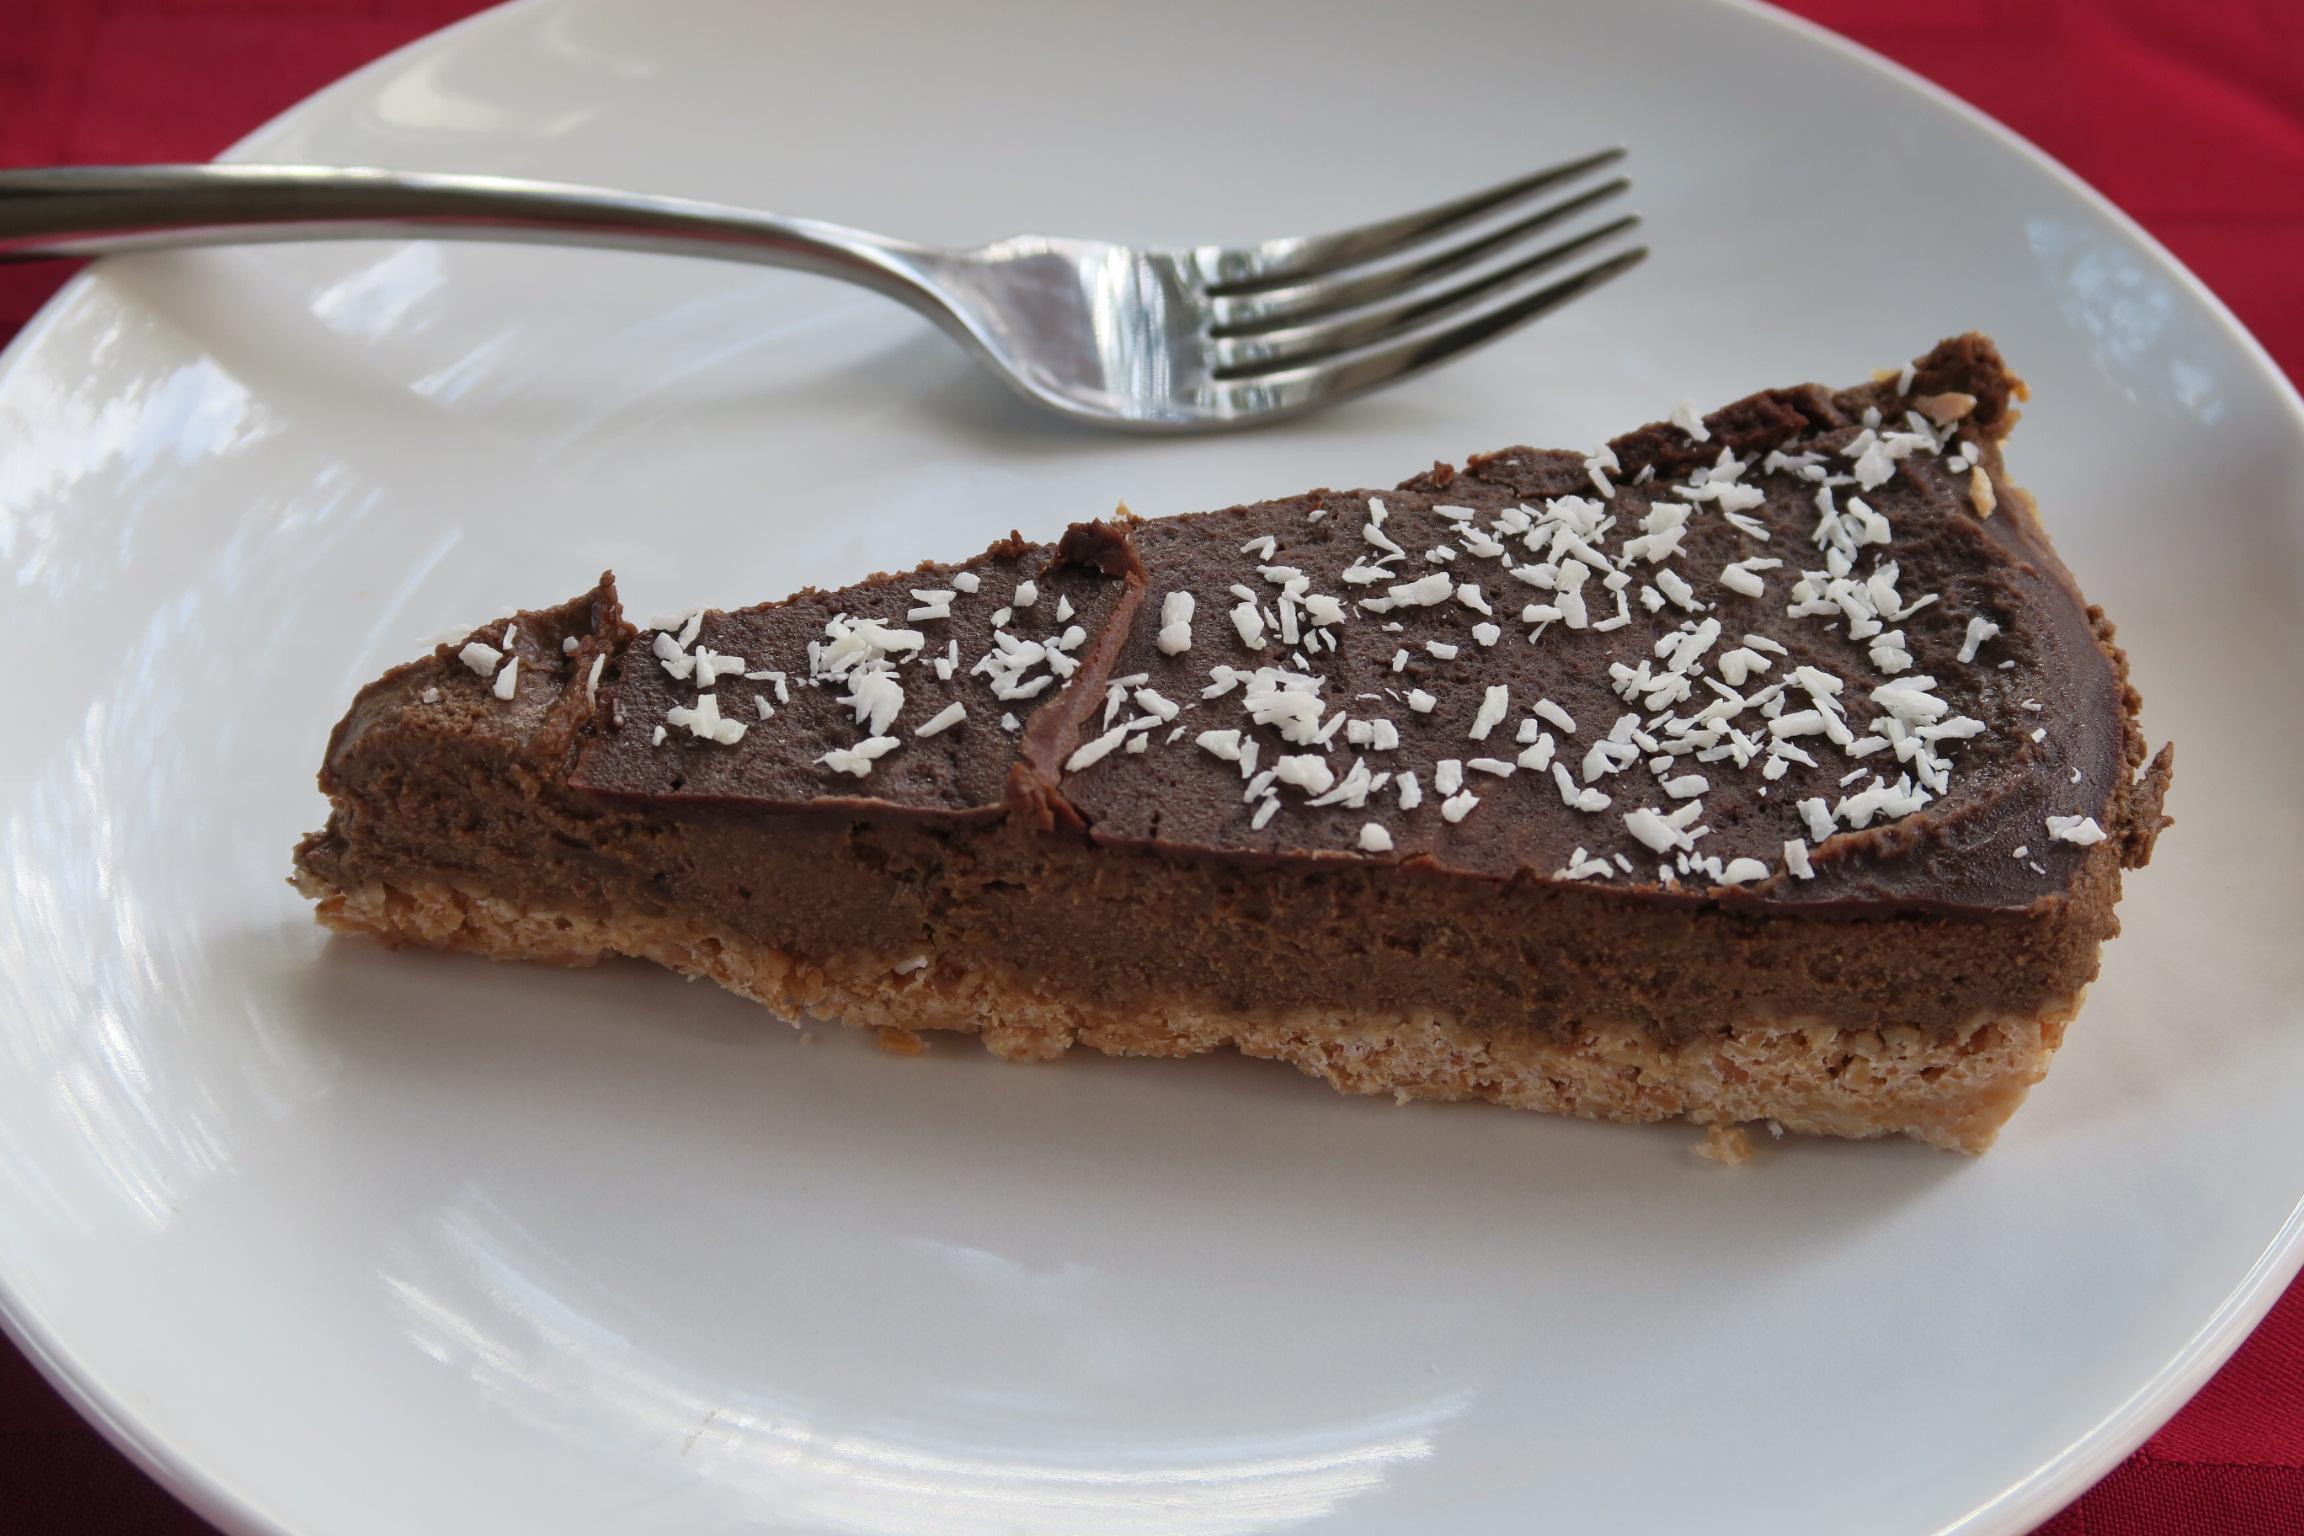 coconut-chocolate-mousse-pie.jpg